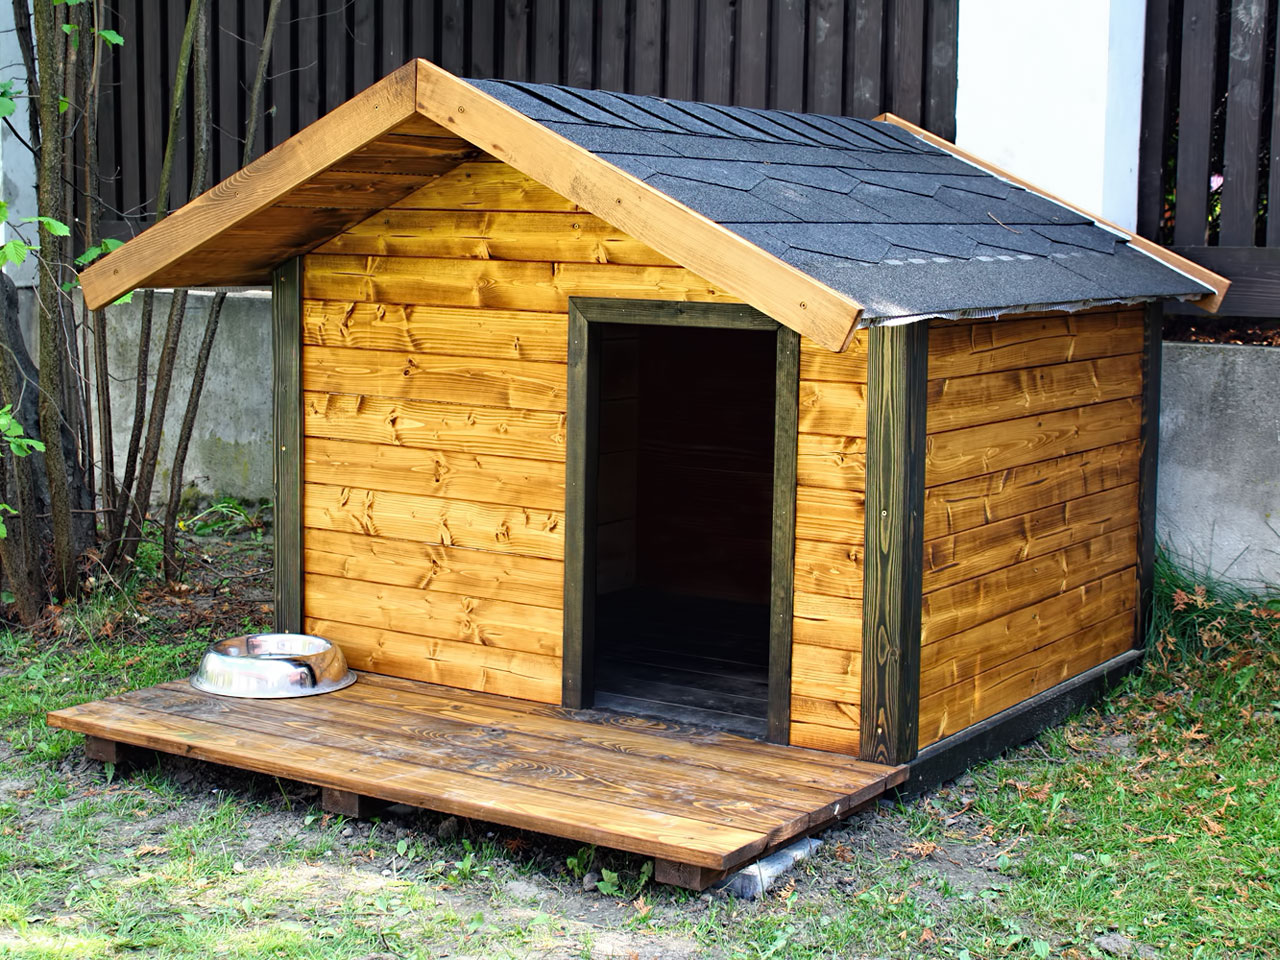 Holz Hundehütte im Garten